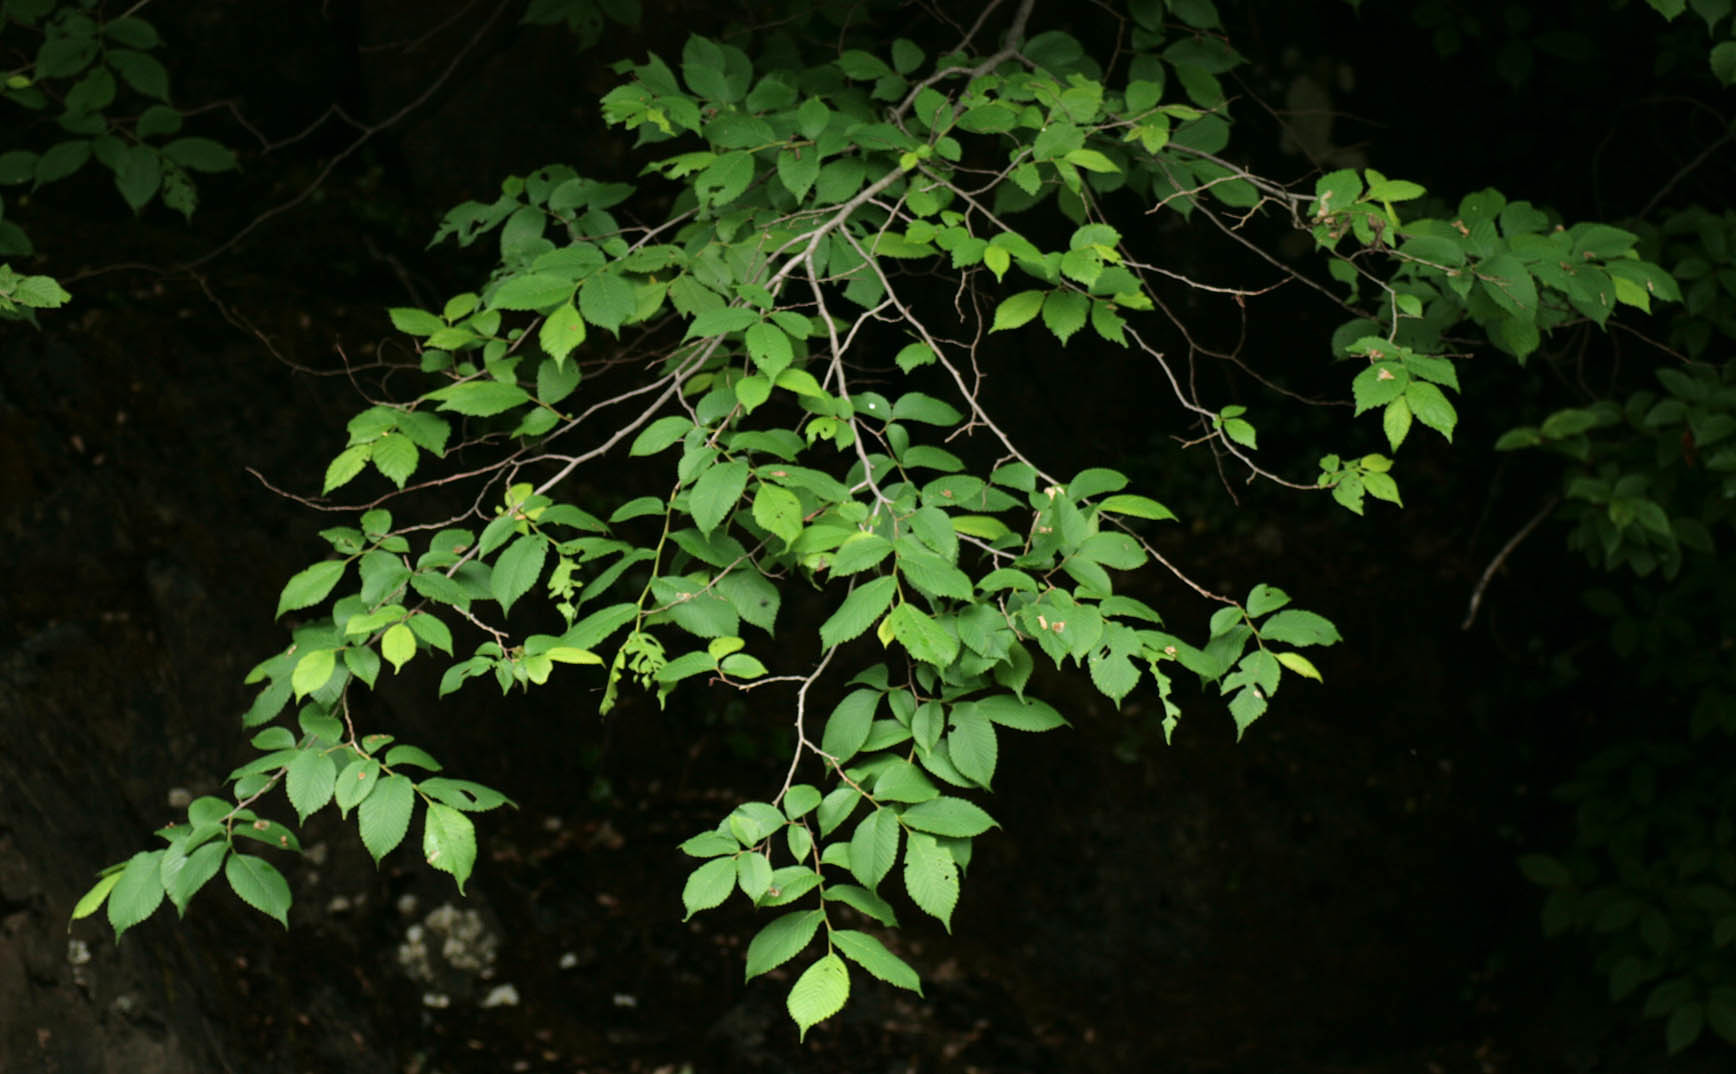 Image of Wych elm